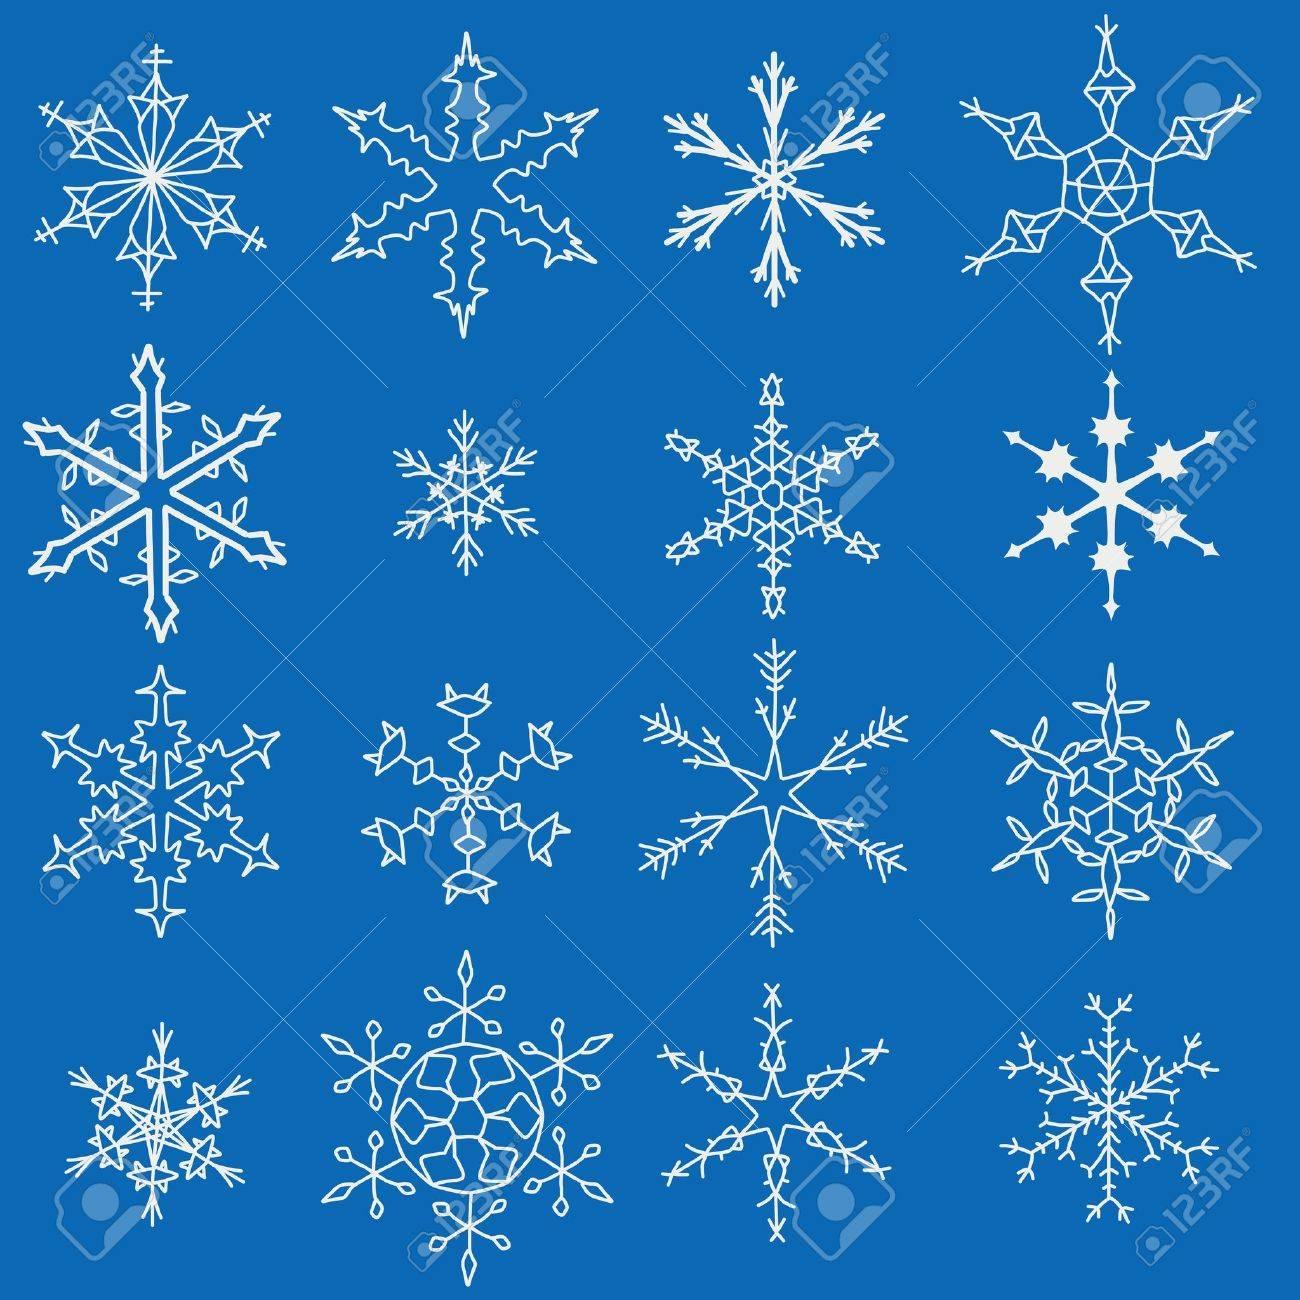 Snowflake winter icons. Set of snow flake symbols. Stock Vector - 15713947